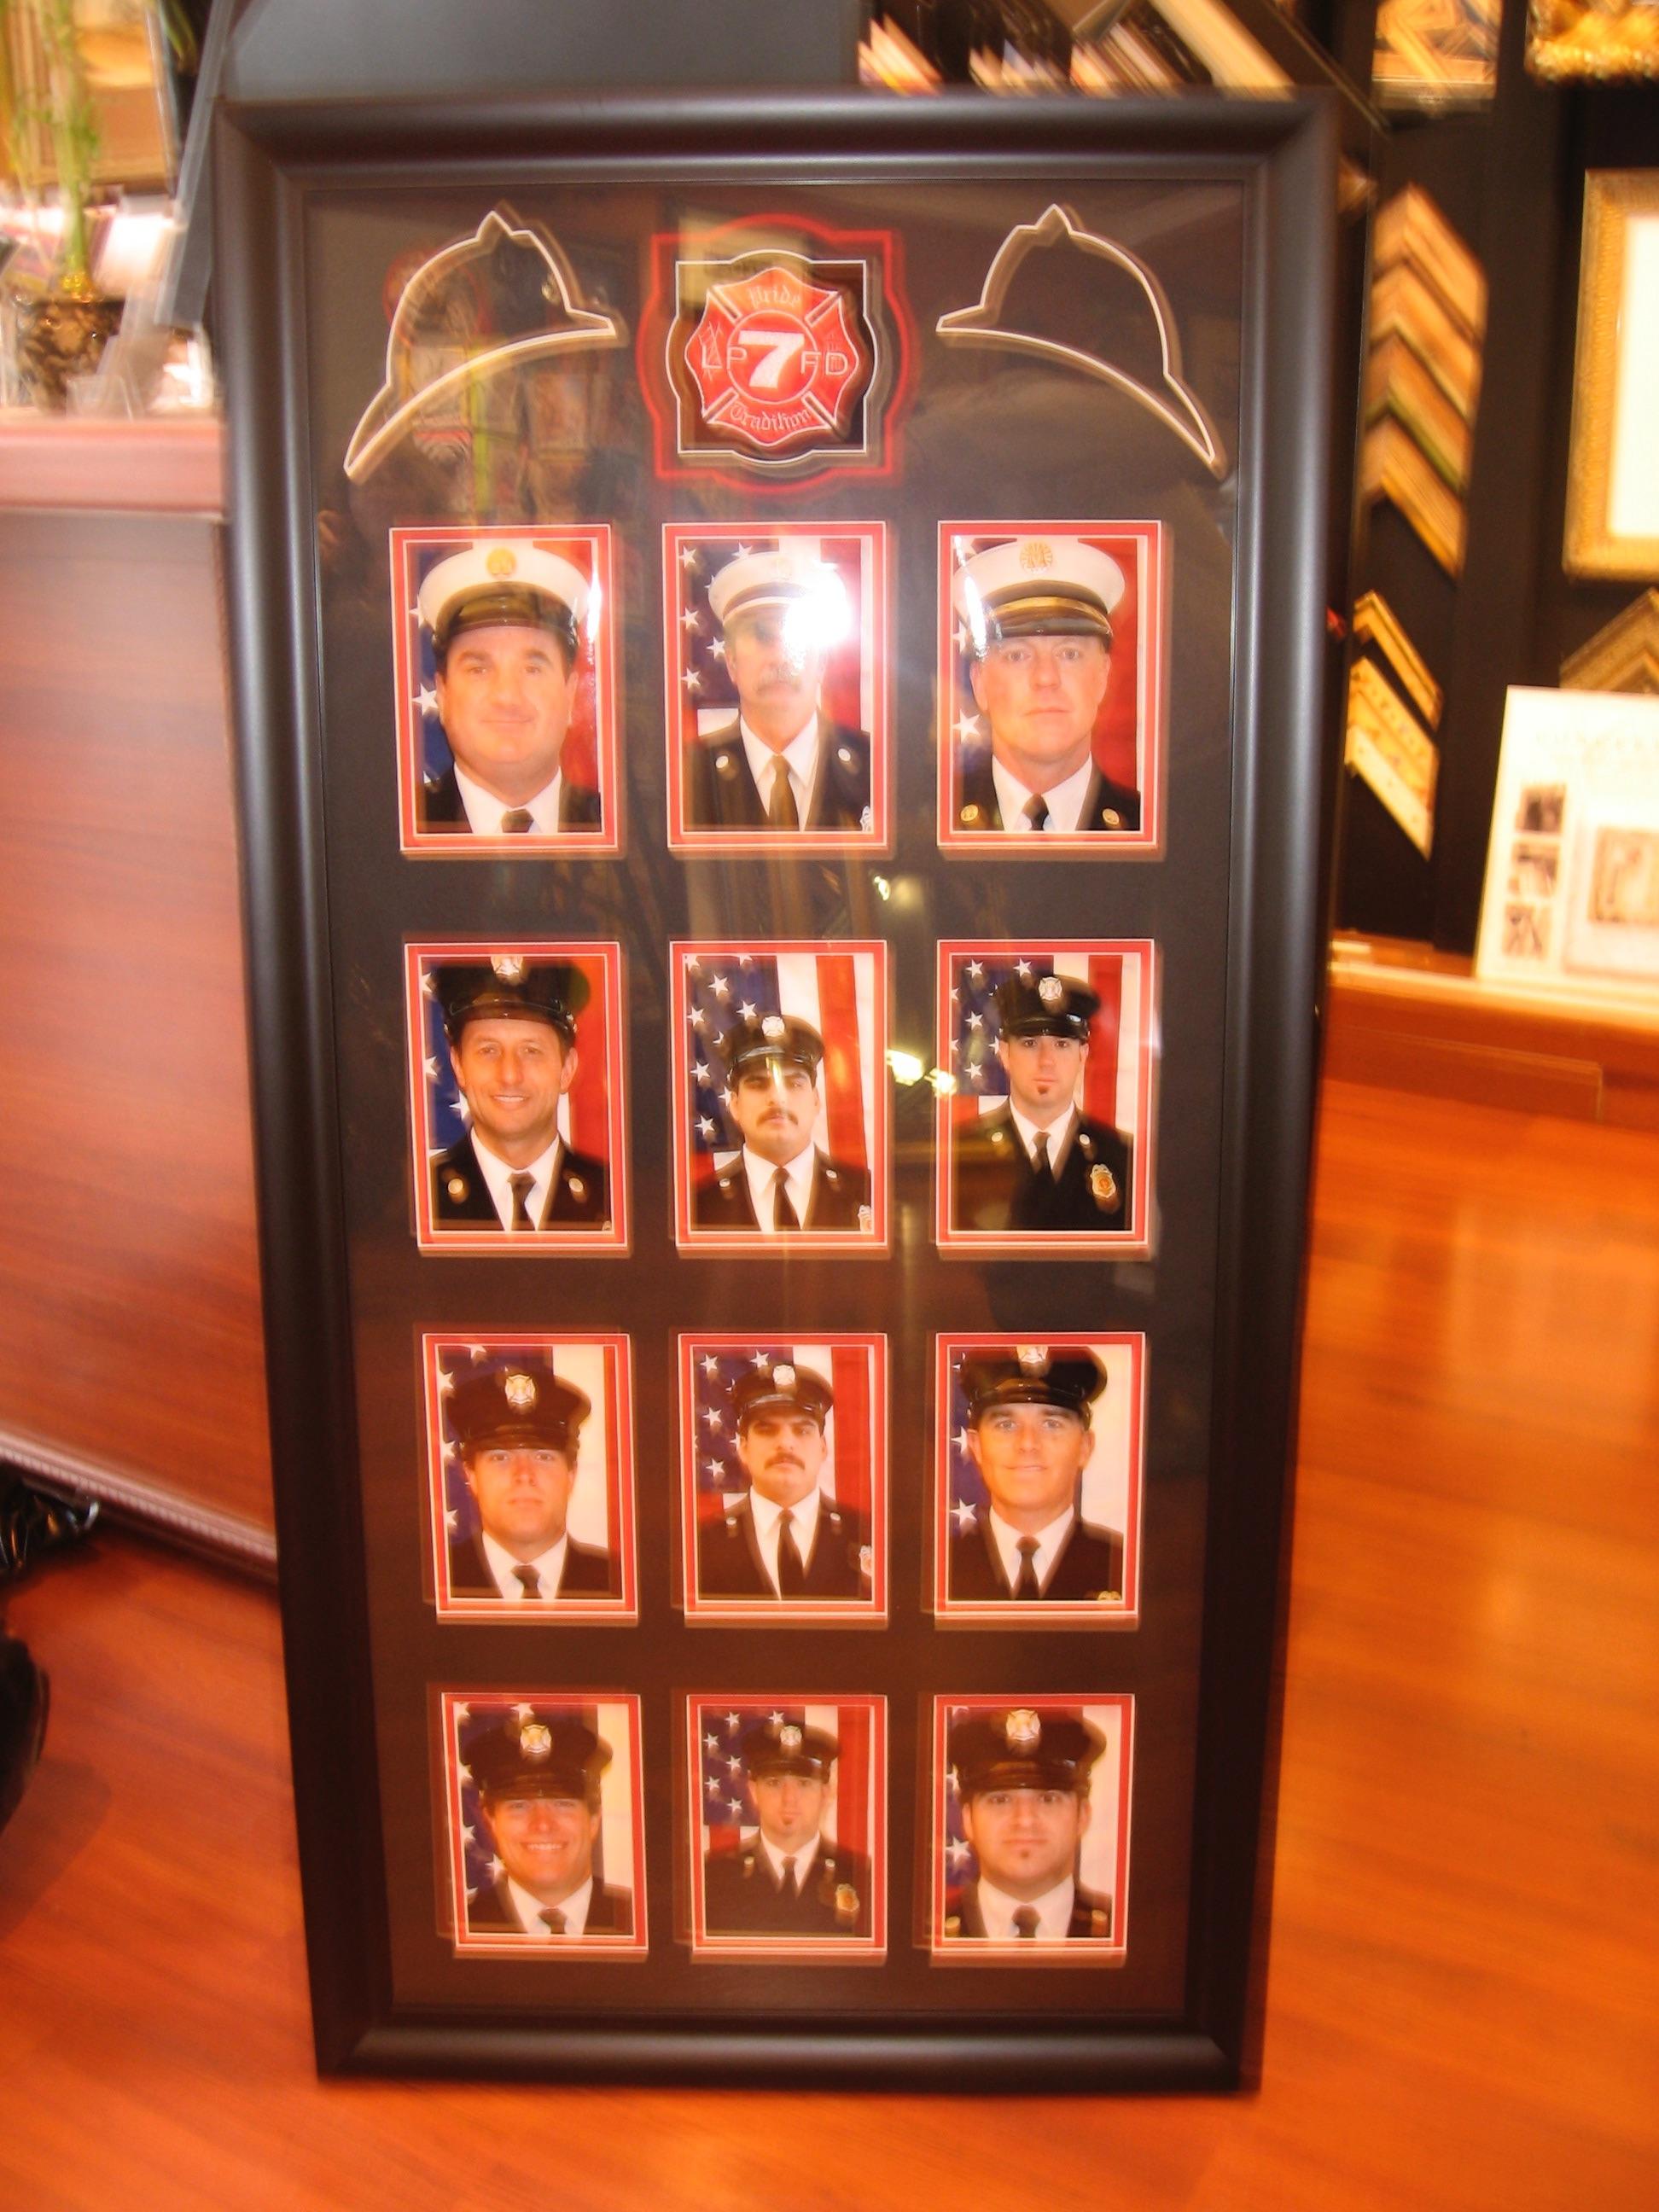 Framed Firefighter Photos